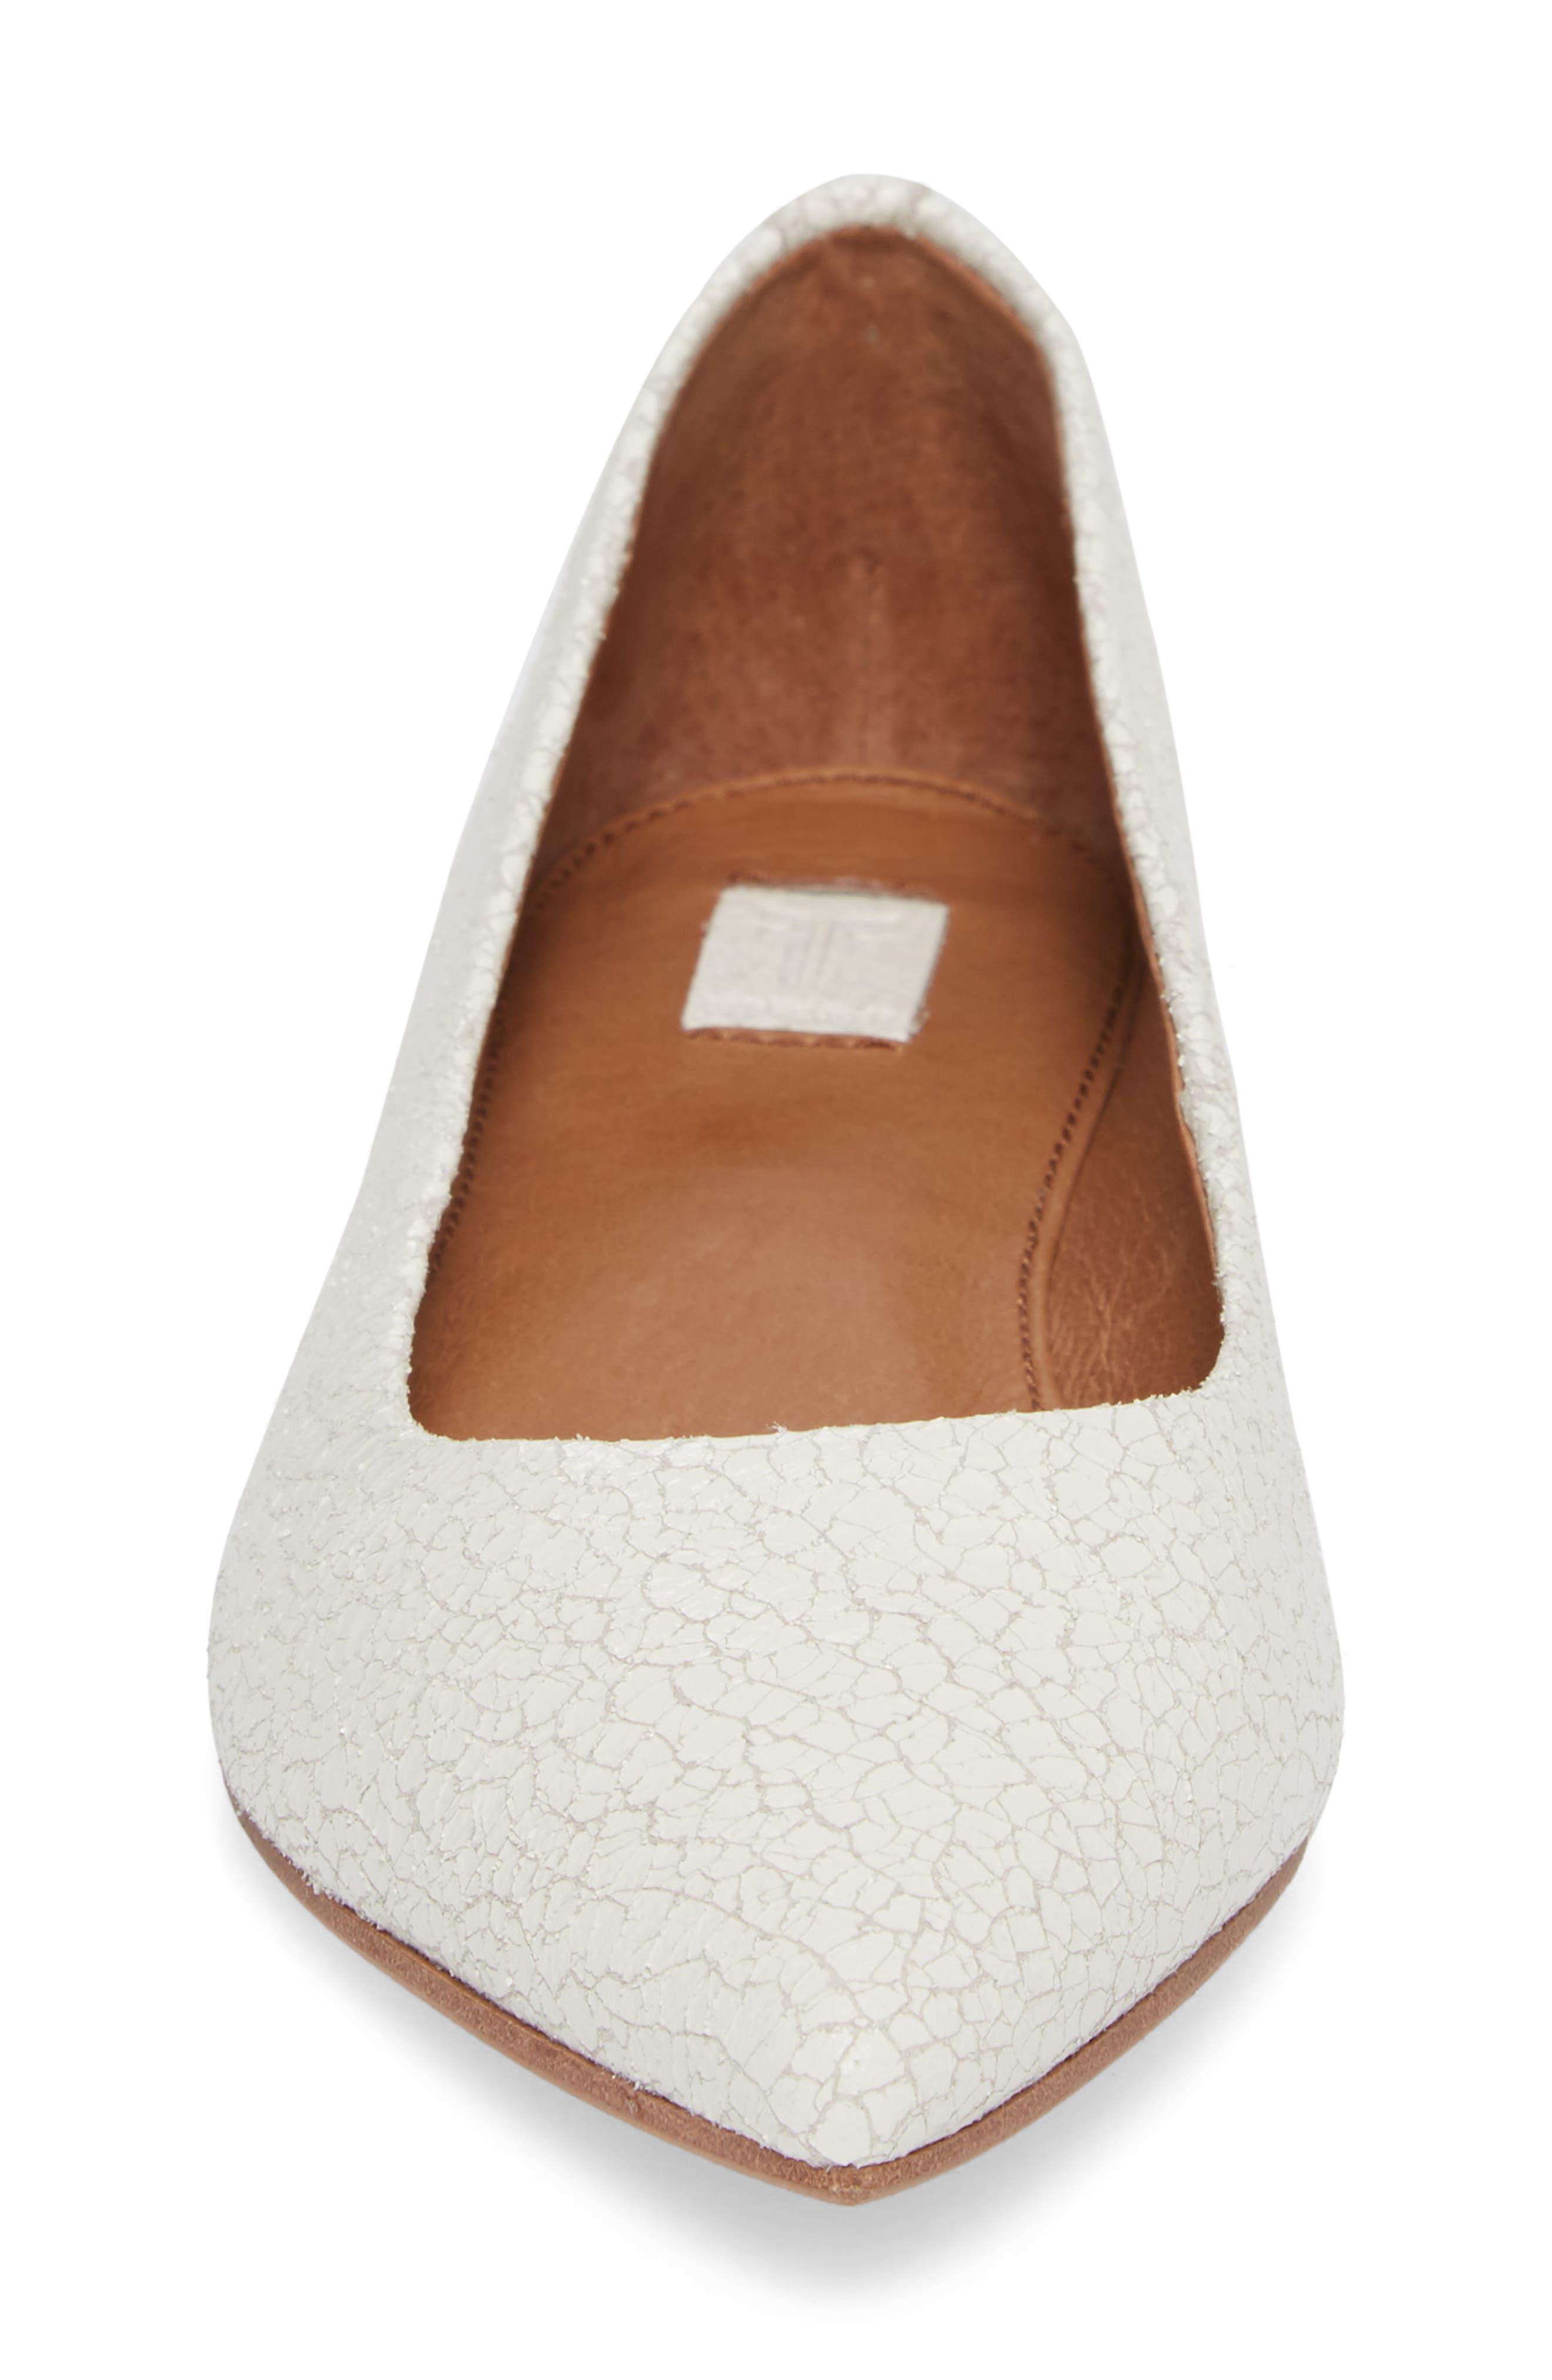 Sienna Pointy Toe Ballet Flat,                             Alternate thumbnail 11, color,